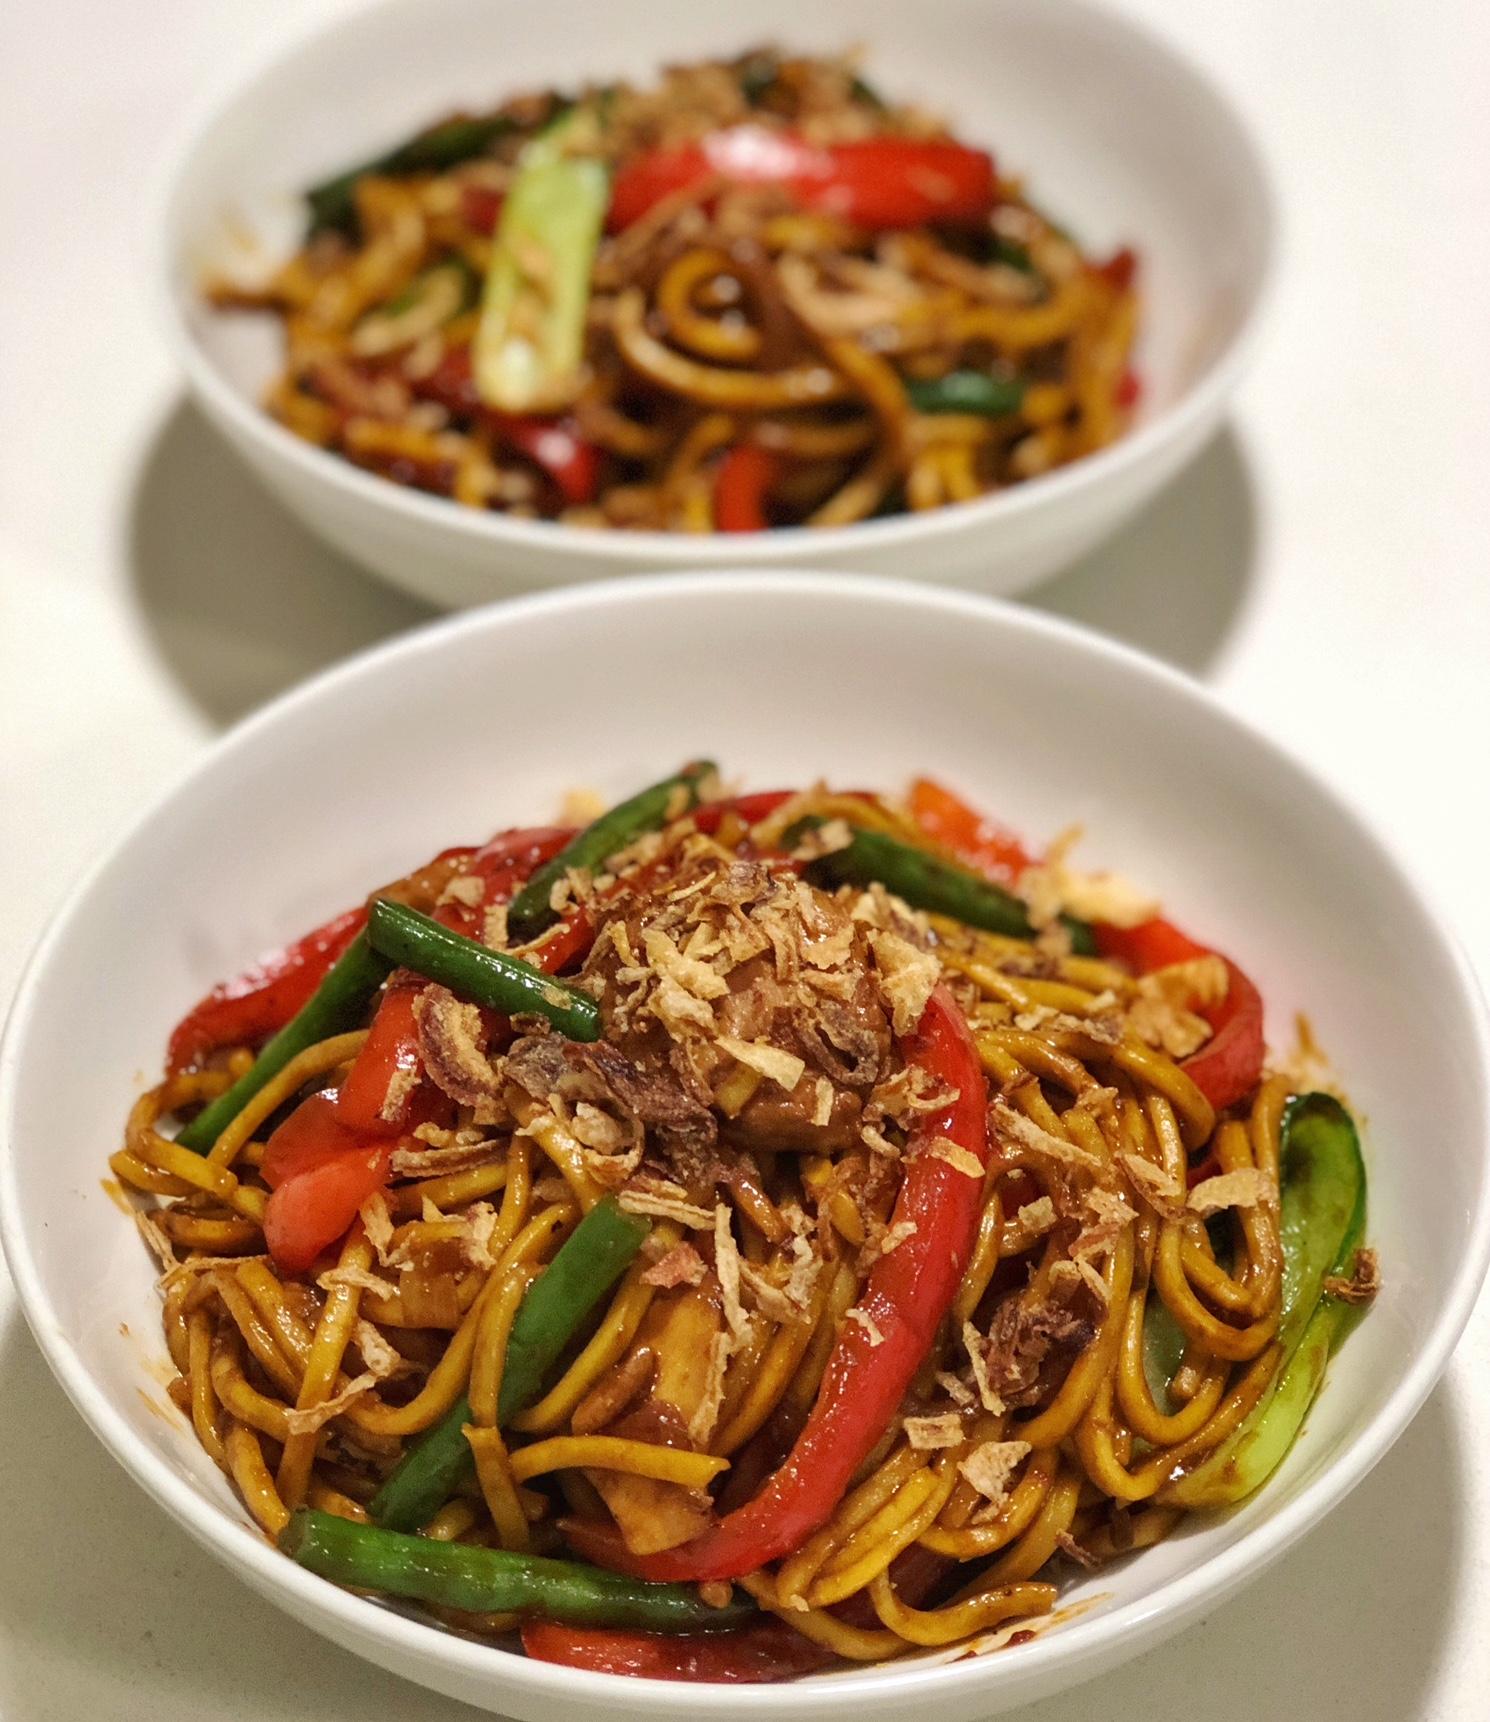 Your Mongolian Chicken Noodles be readdddddddy